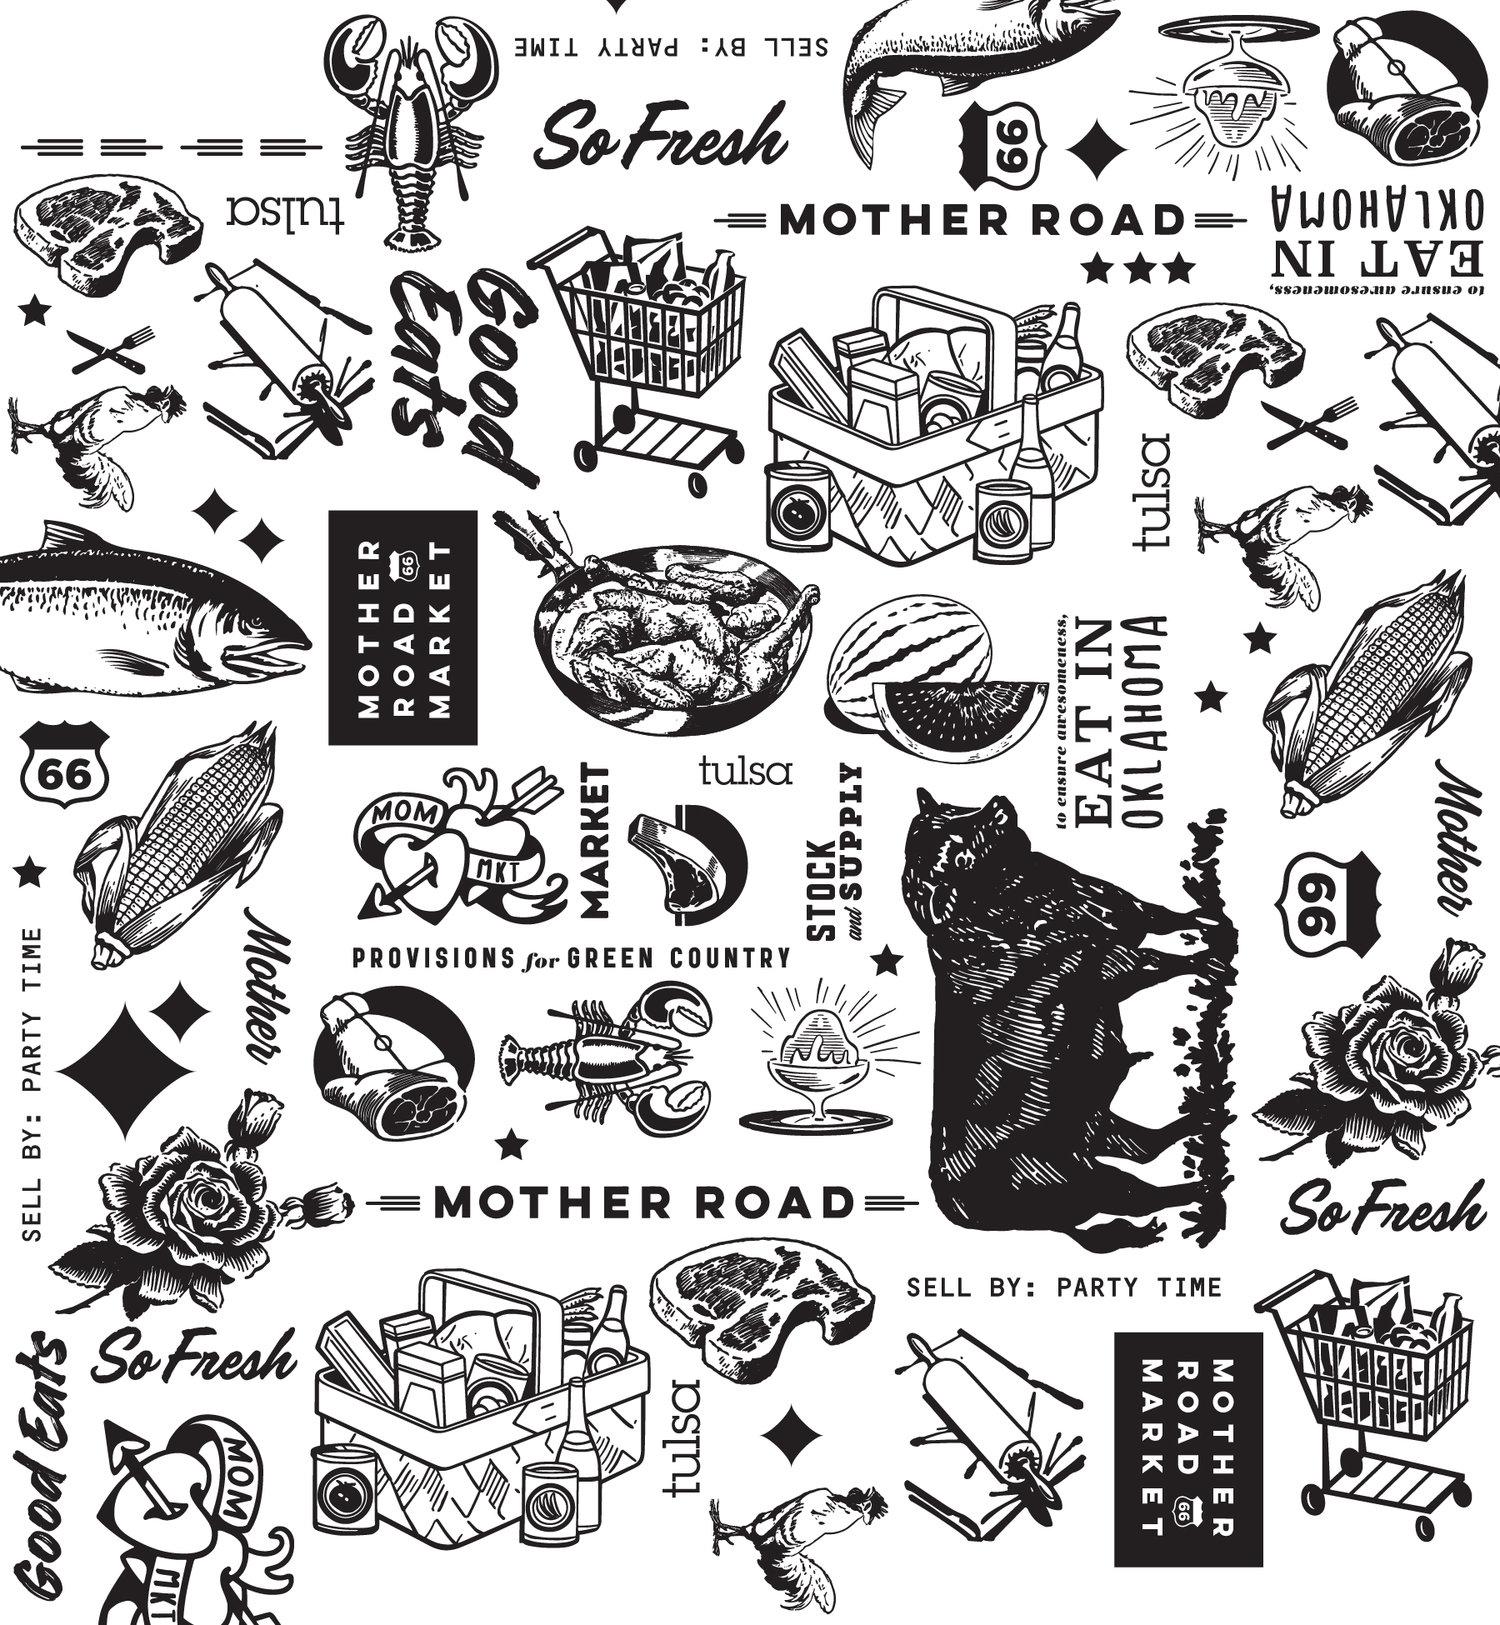 OUR MERCHANTS — Mother Road Market